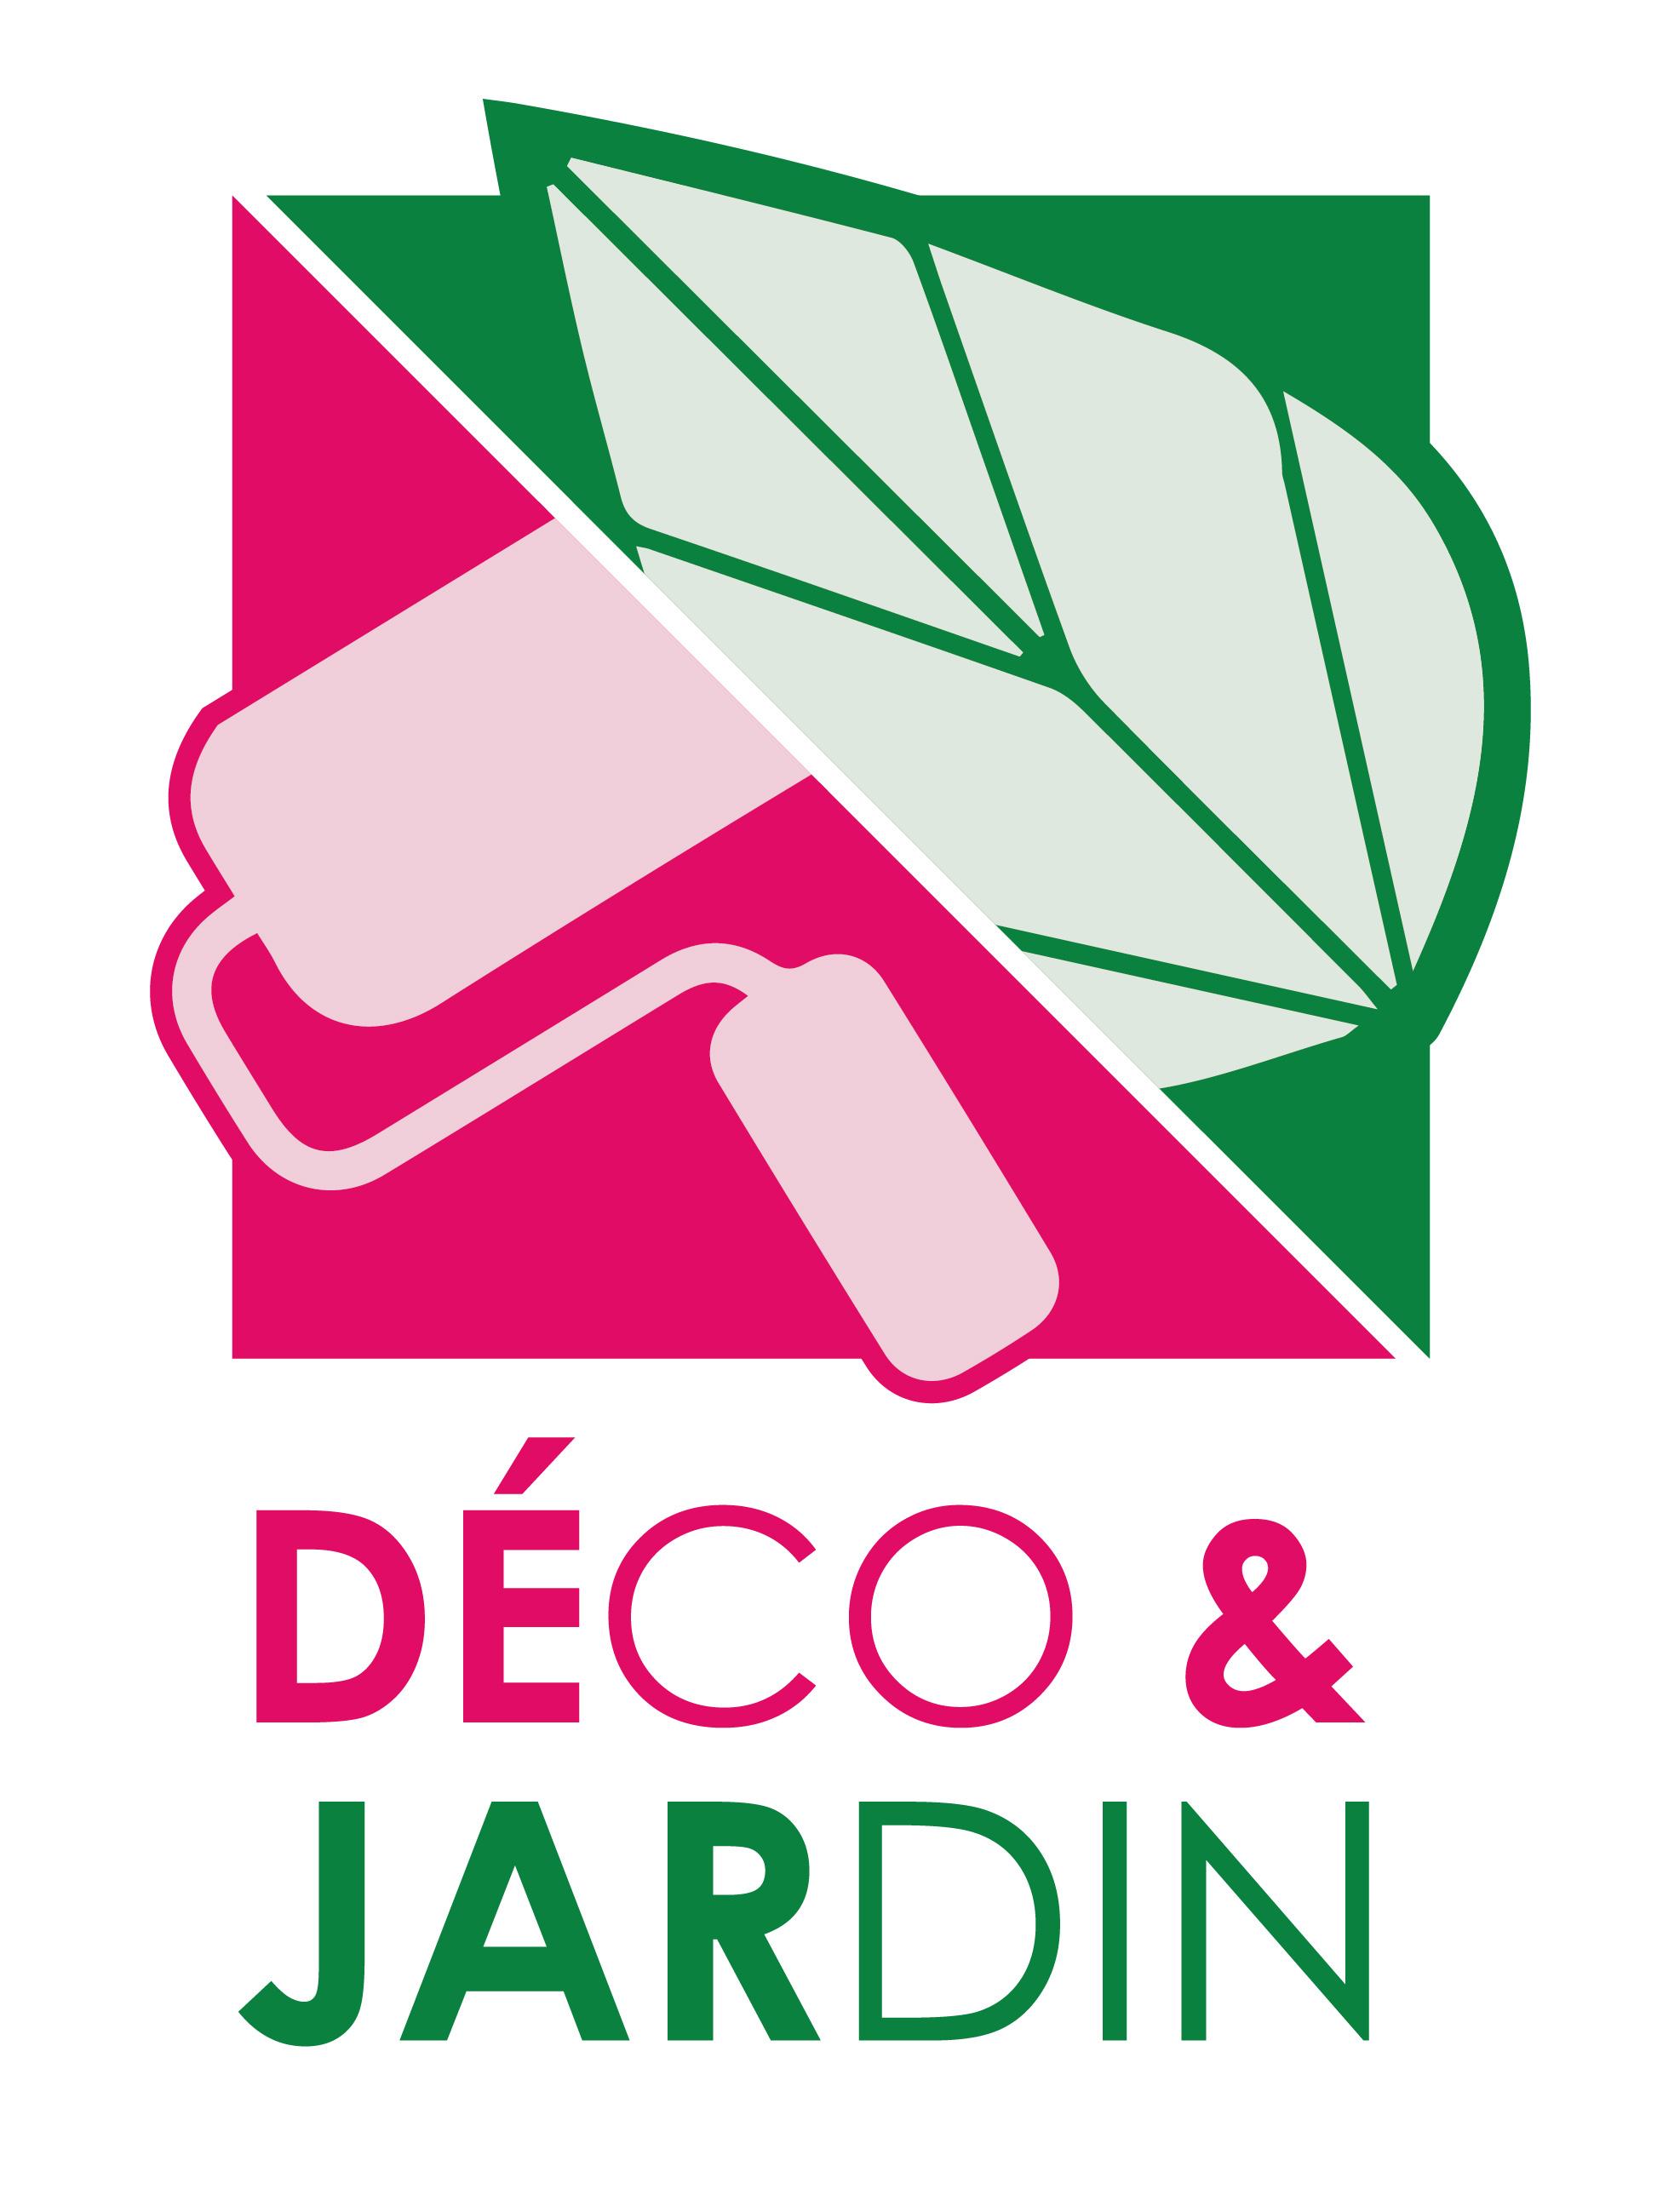 Emejing salon deco et jardin tournai photos amazing for Deco jardin tournai 2015